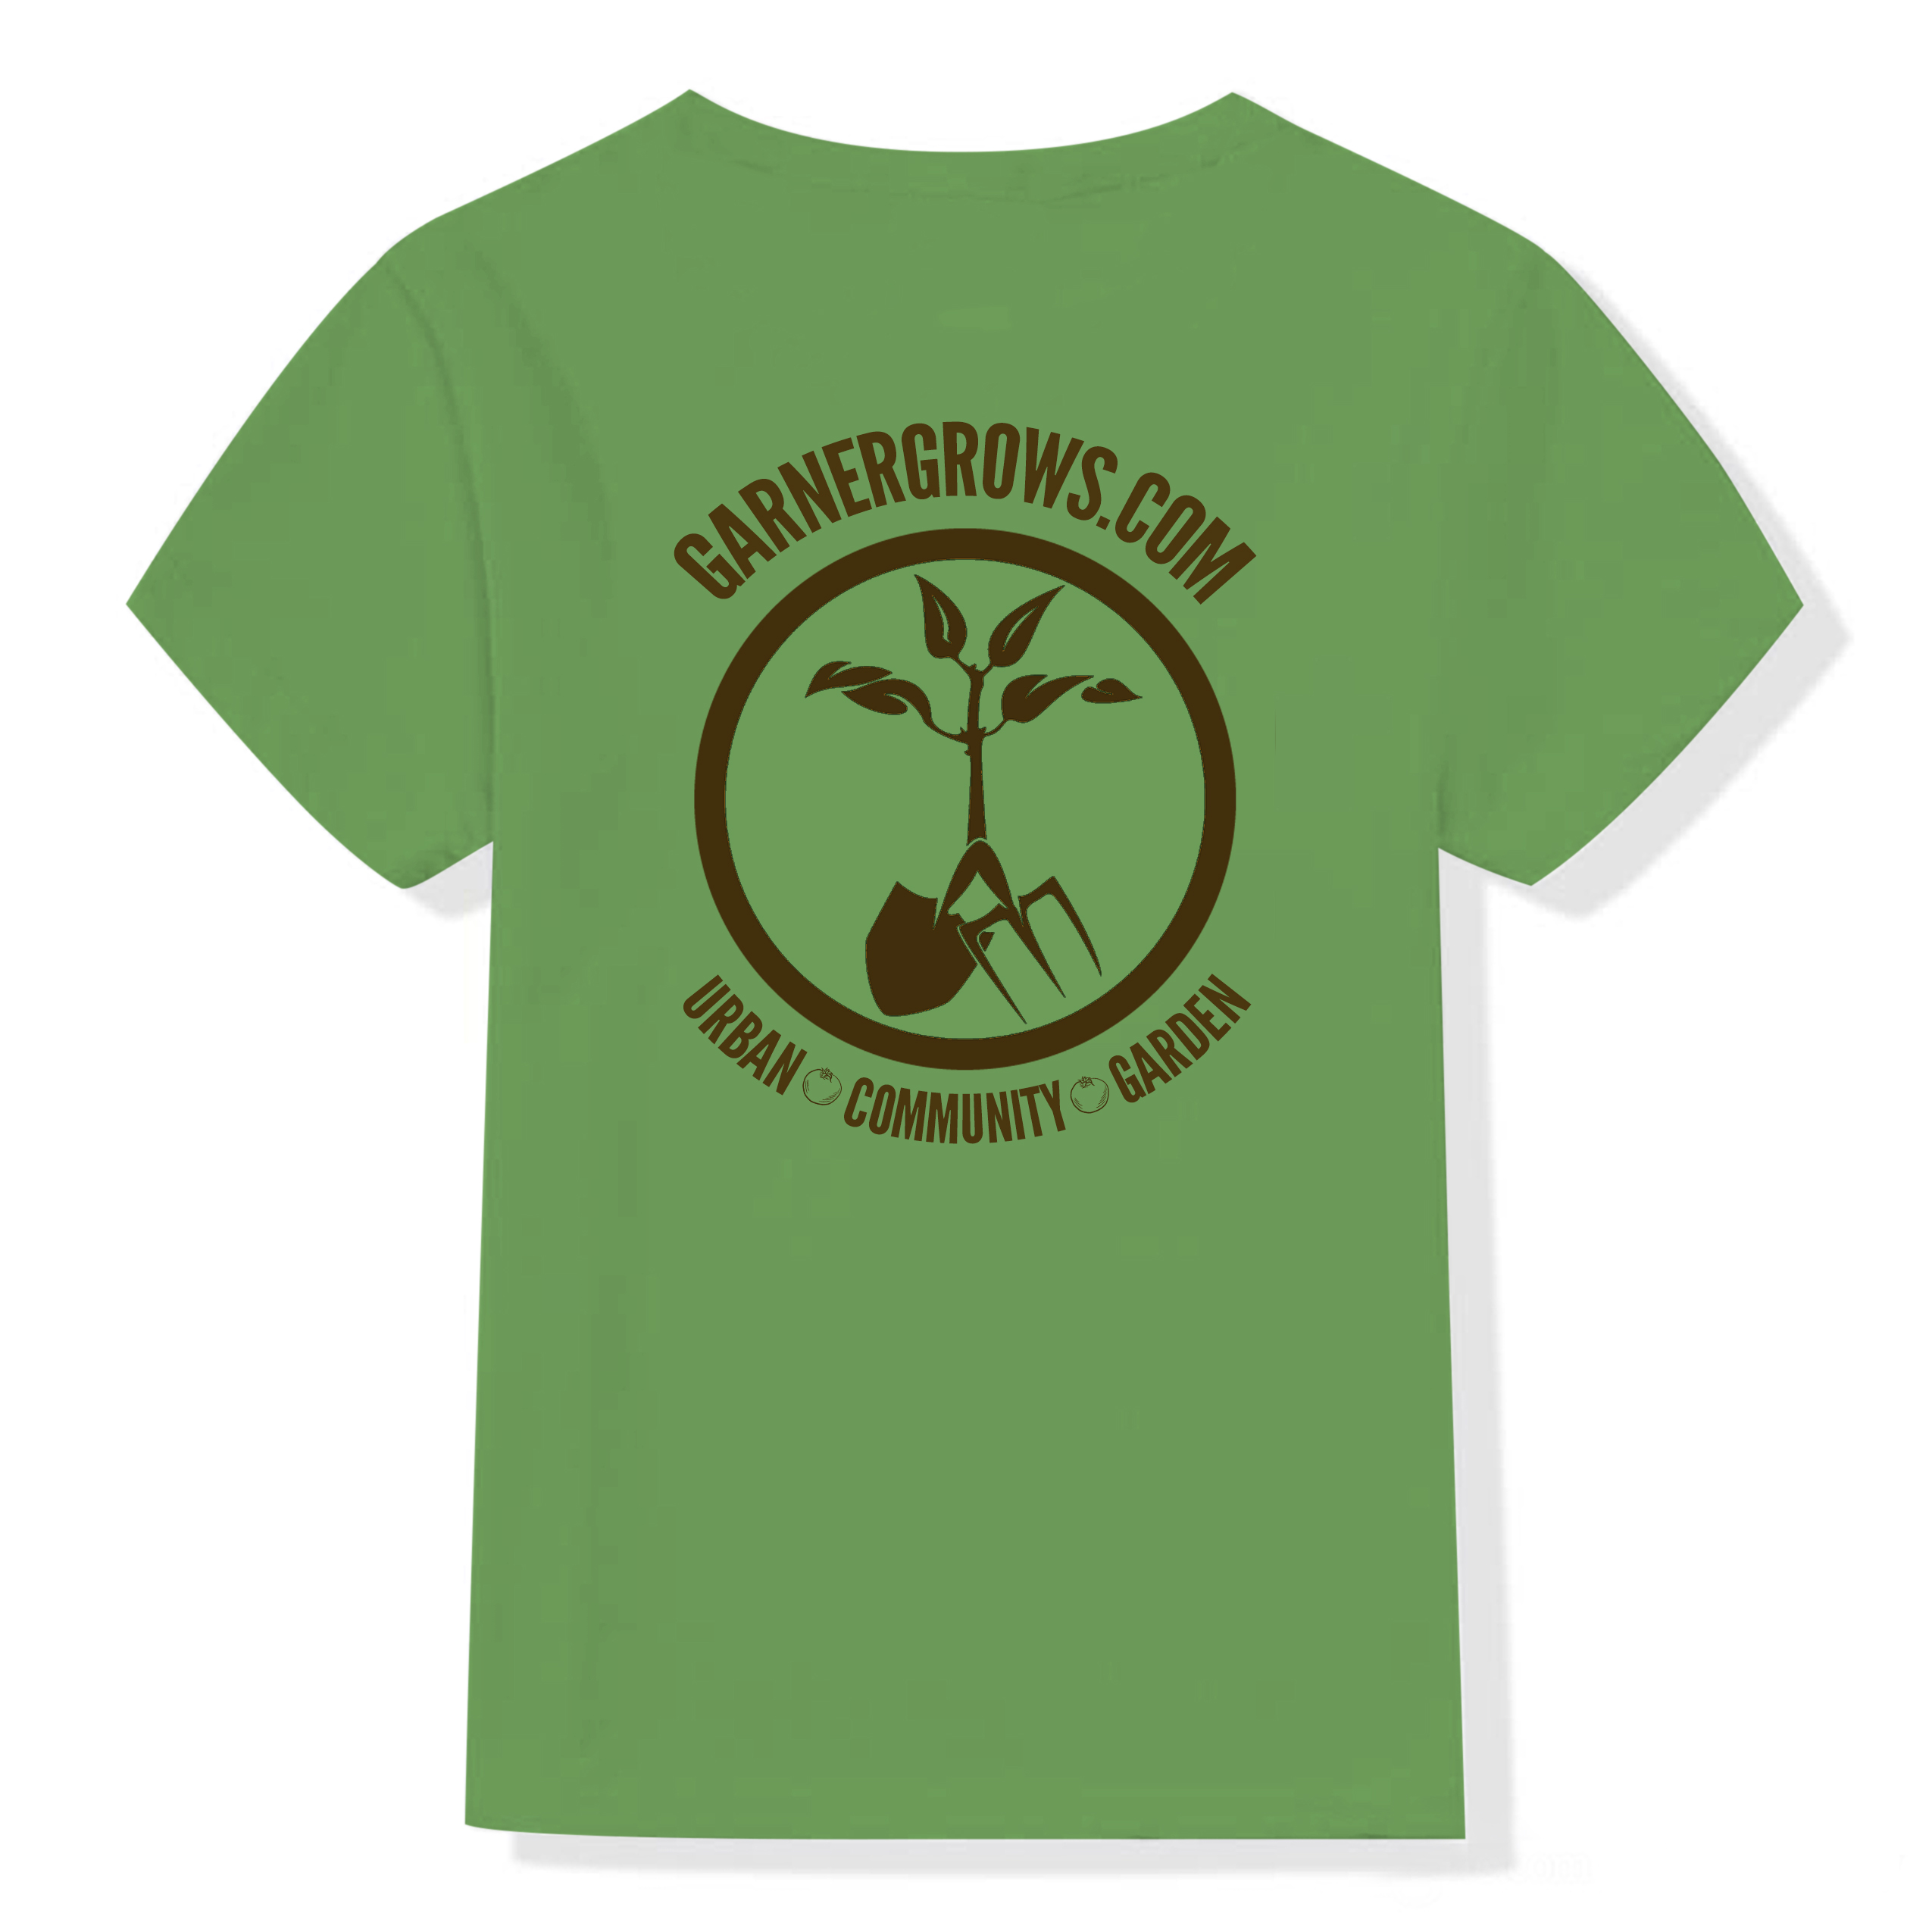 Garner grows green tee shirt the logo image and caption Urban Community Garden